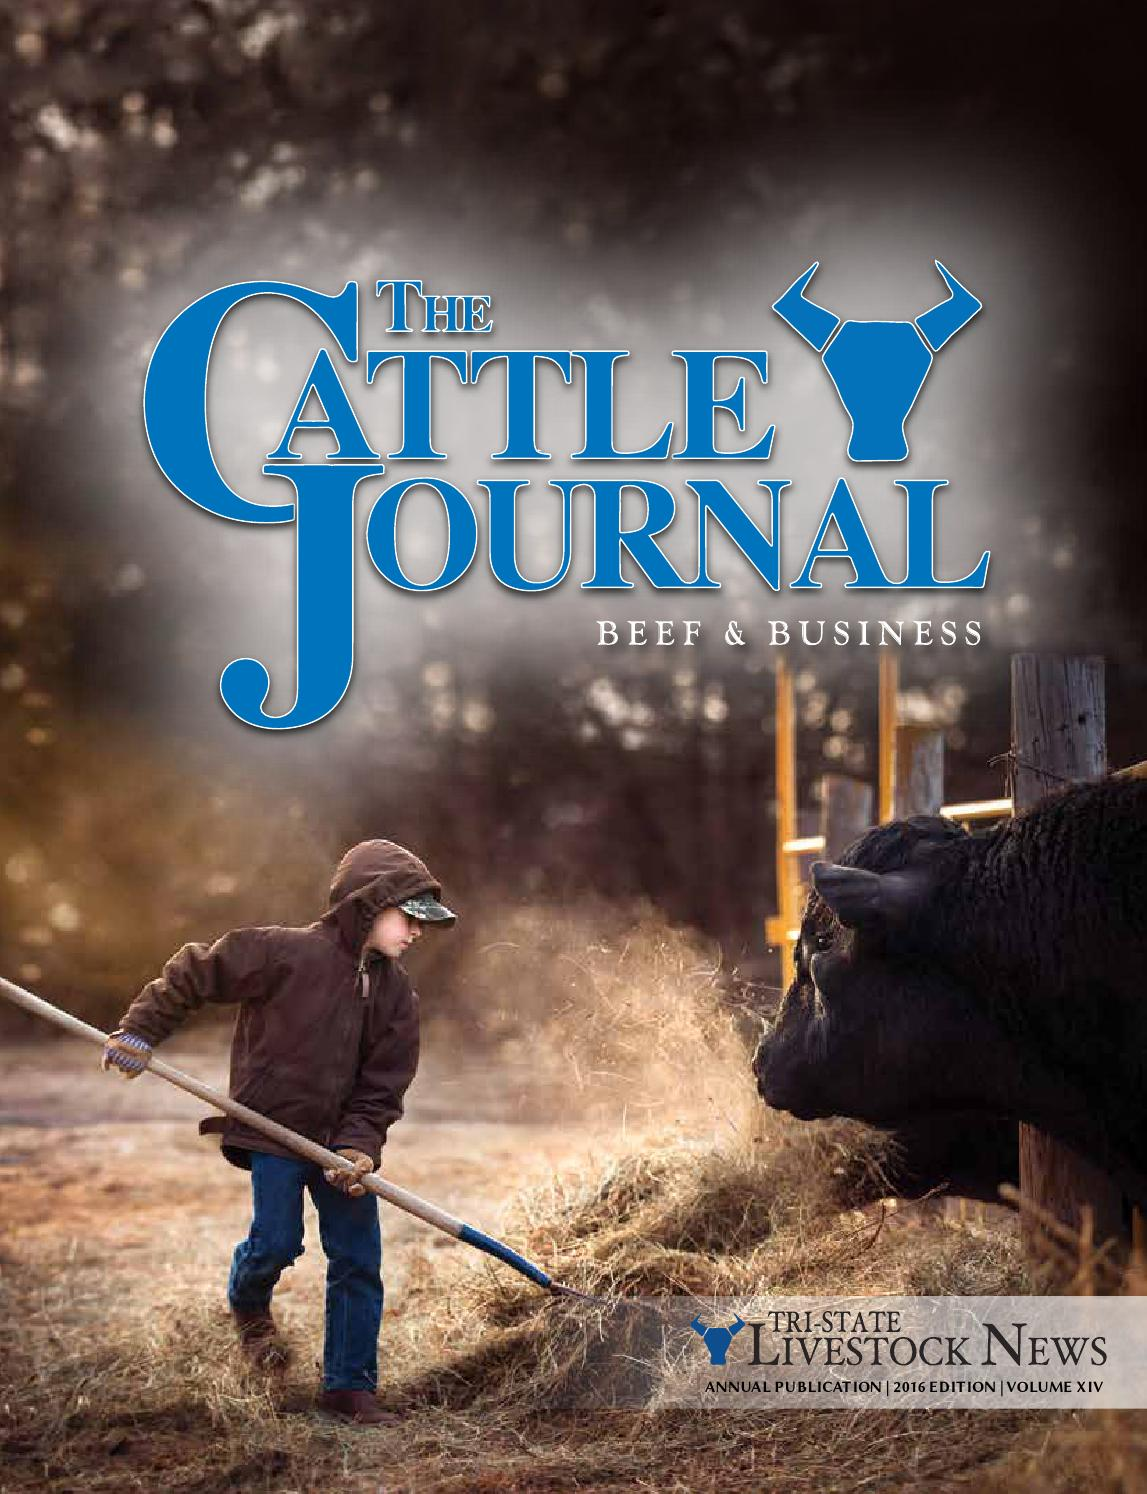 2X-Large Bob Dale 64-1-682-X2L Heavy Duty Brown Cow Side split Bib Overall Apron Brown